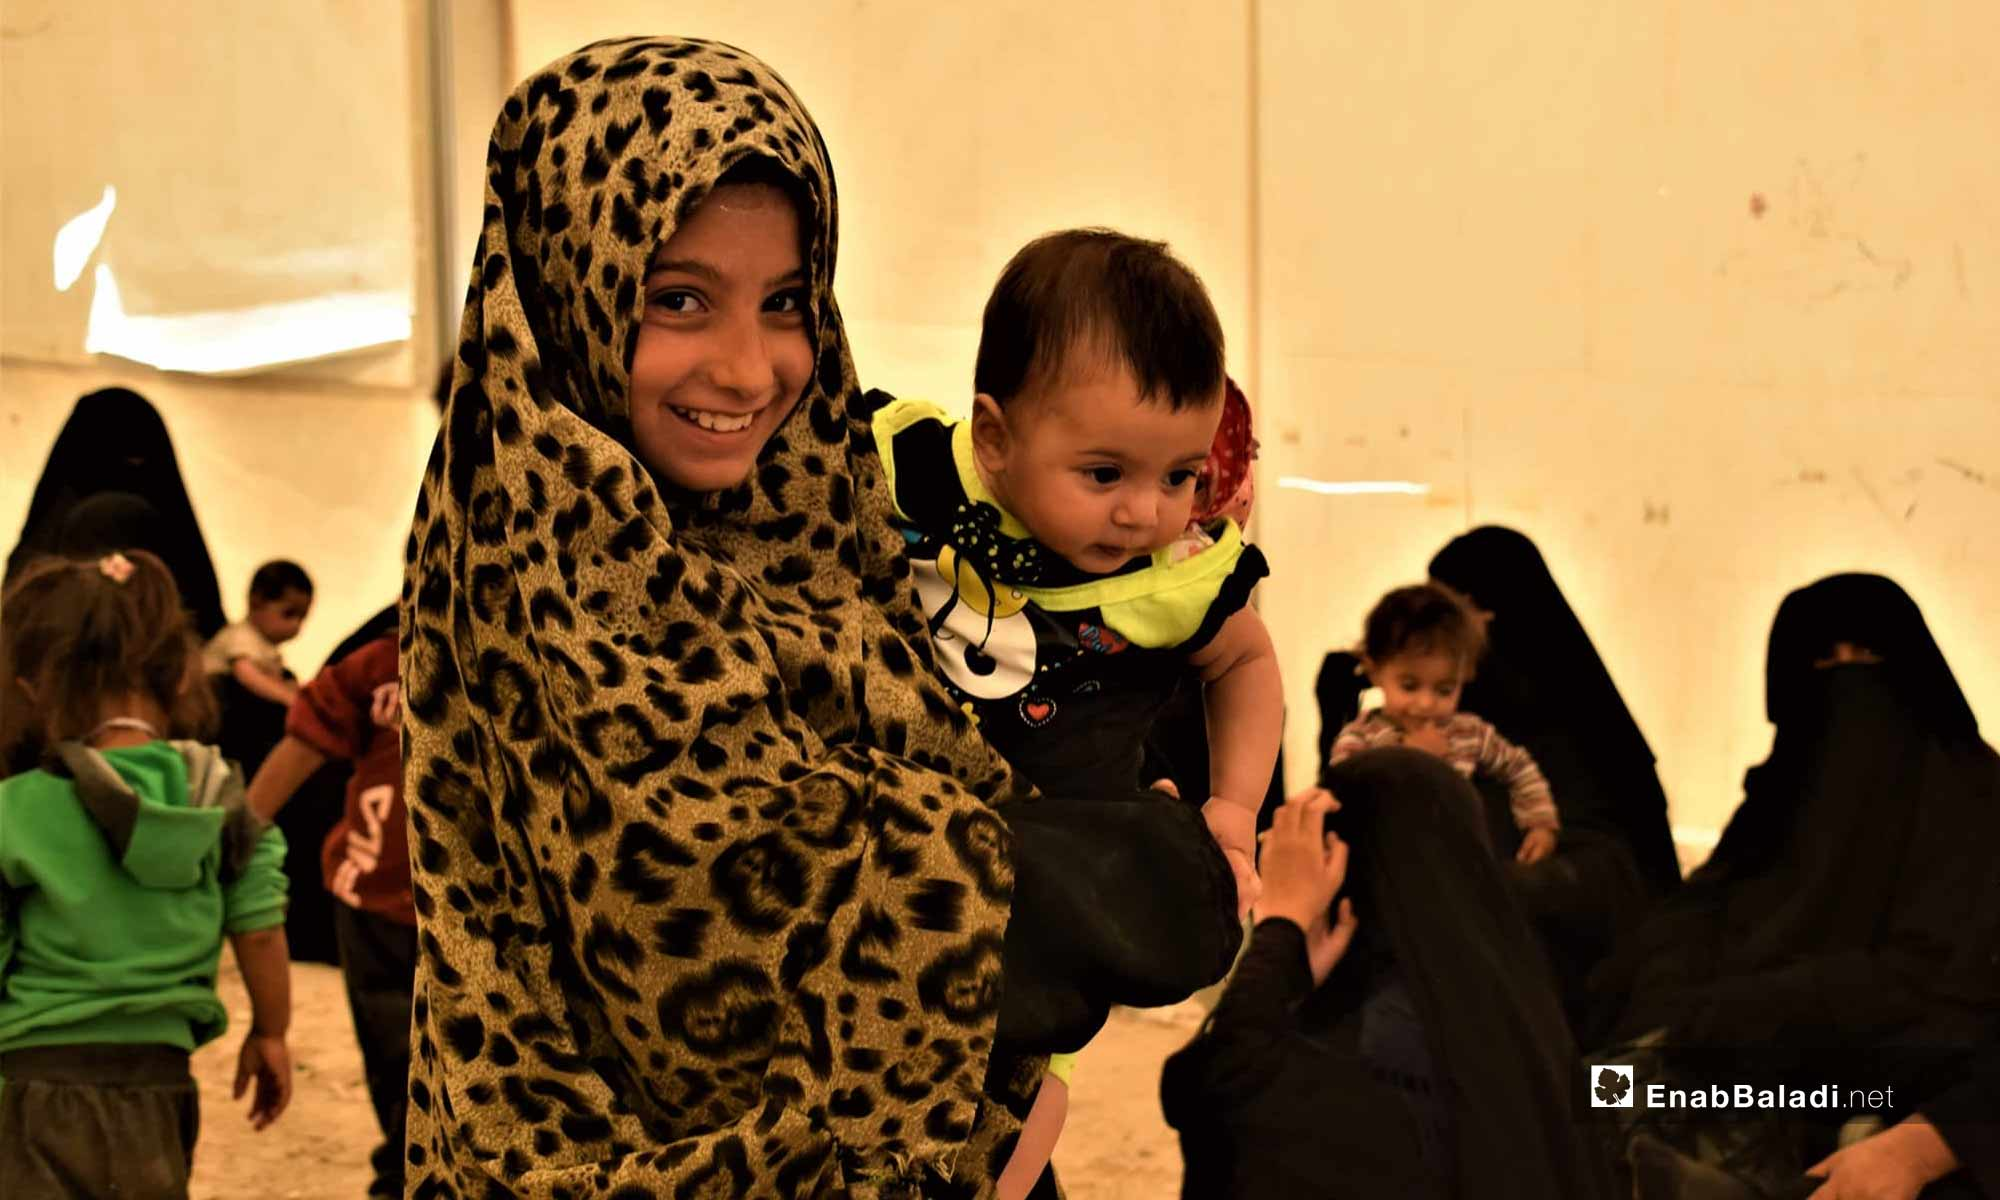 Child at the al-Hawl IDP Camp, east of the Euphrates – July 18, 2019 (Enab Baladi)